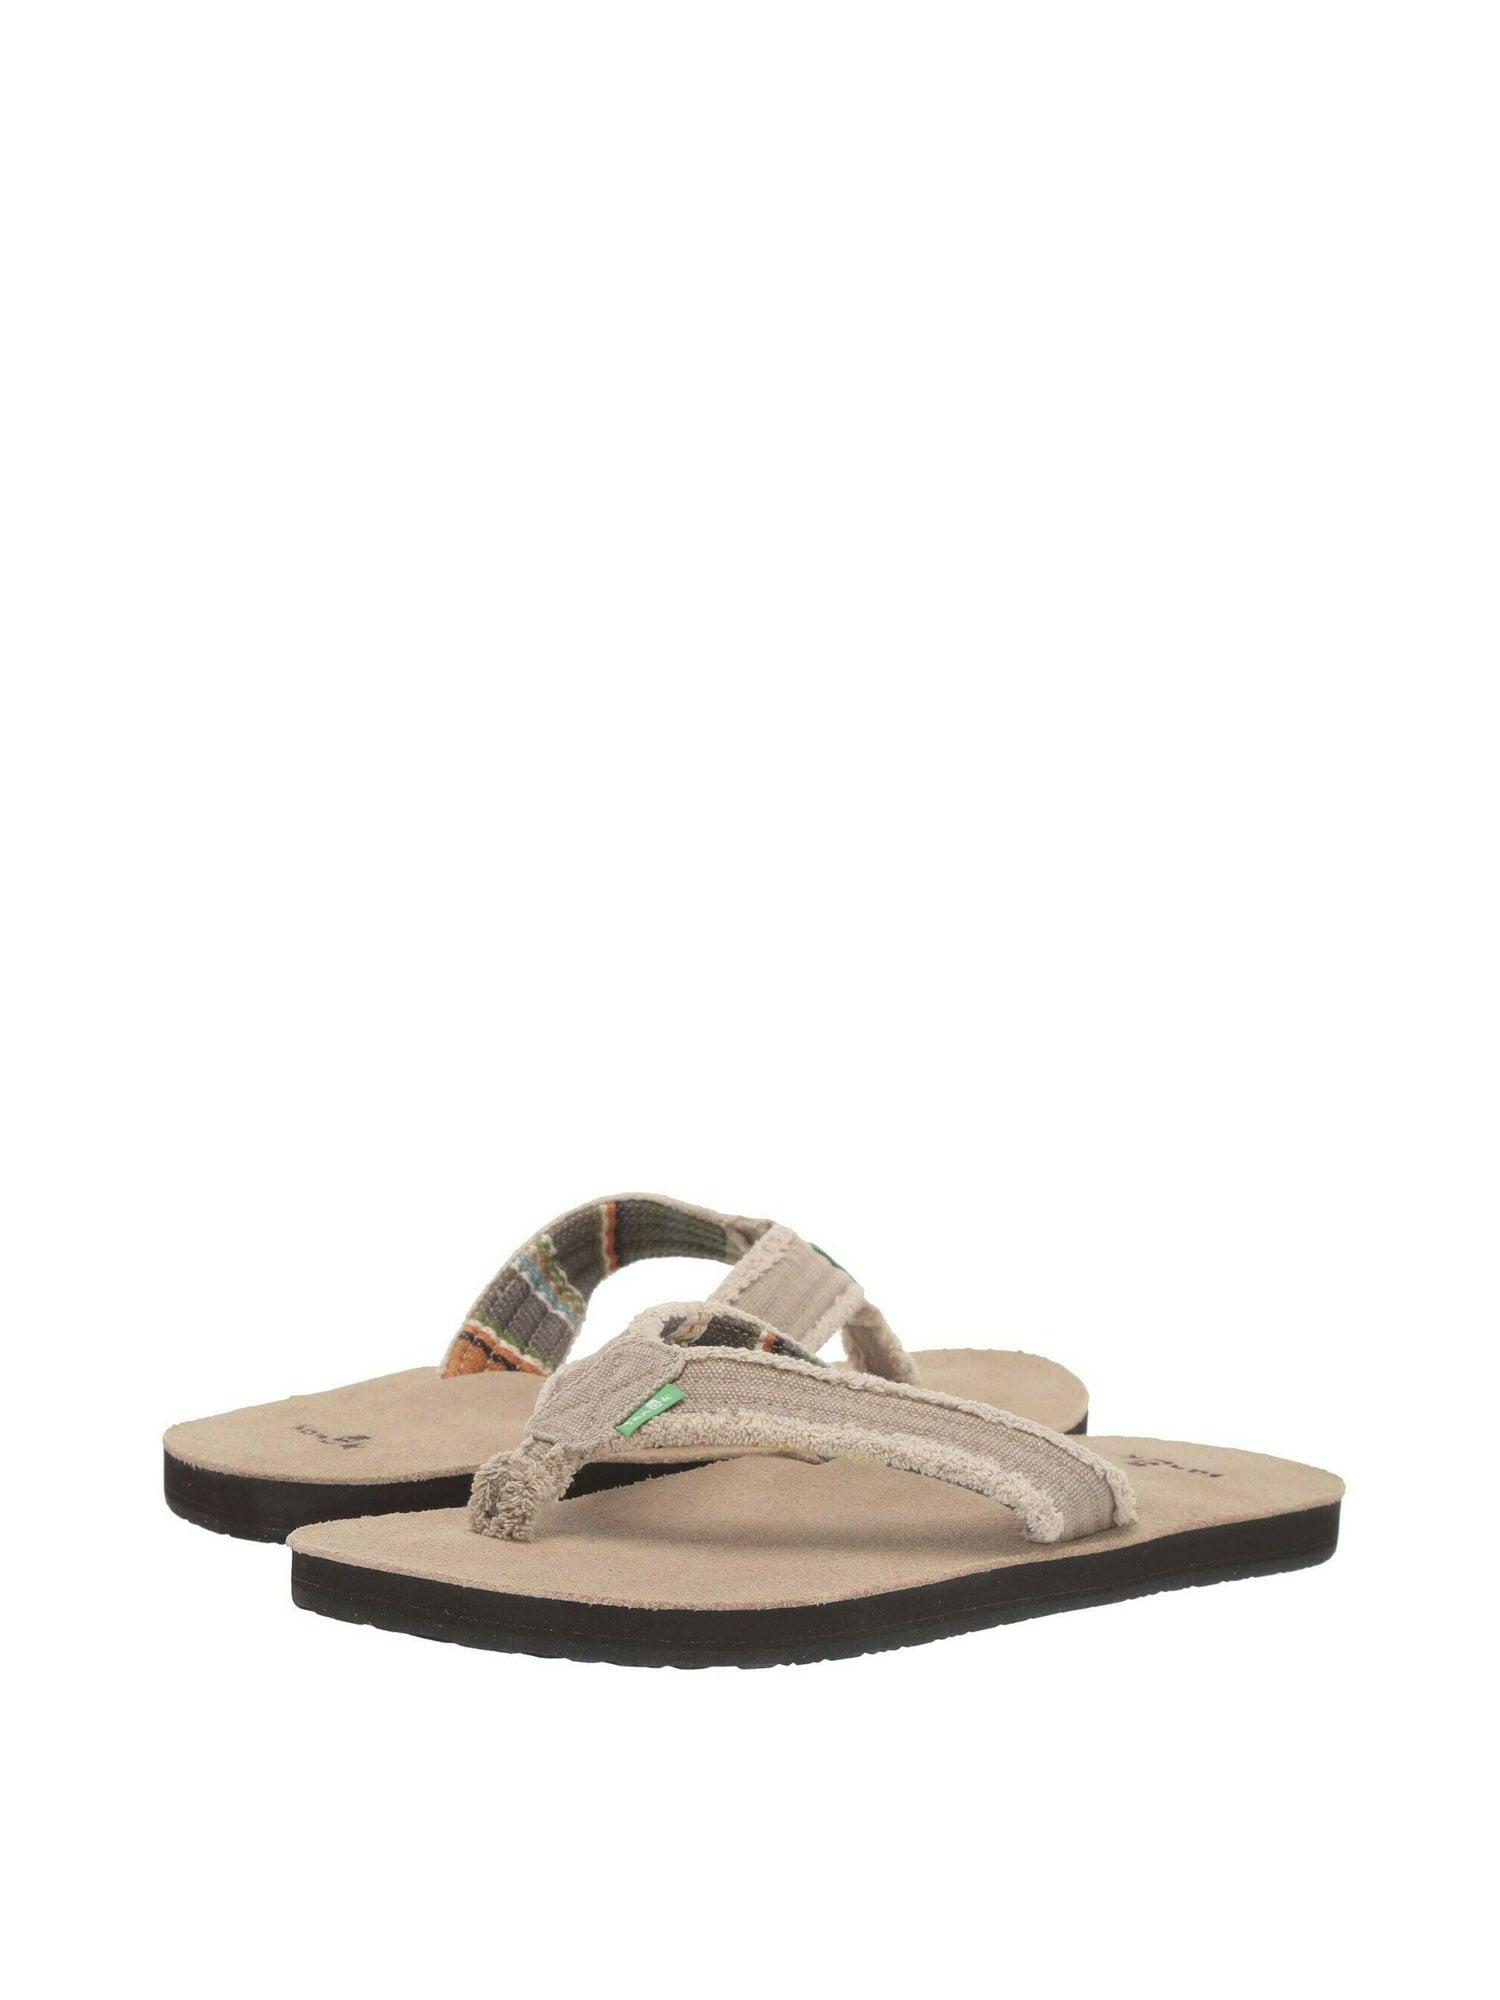 Sanuk FRAID NOT Tan Blanket Men/'s Casual Flip Flop Sandals 1107051